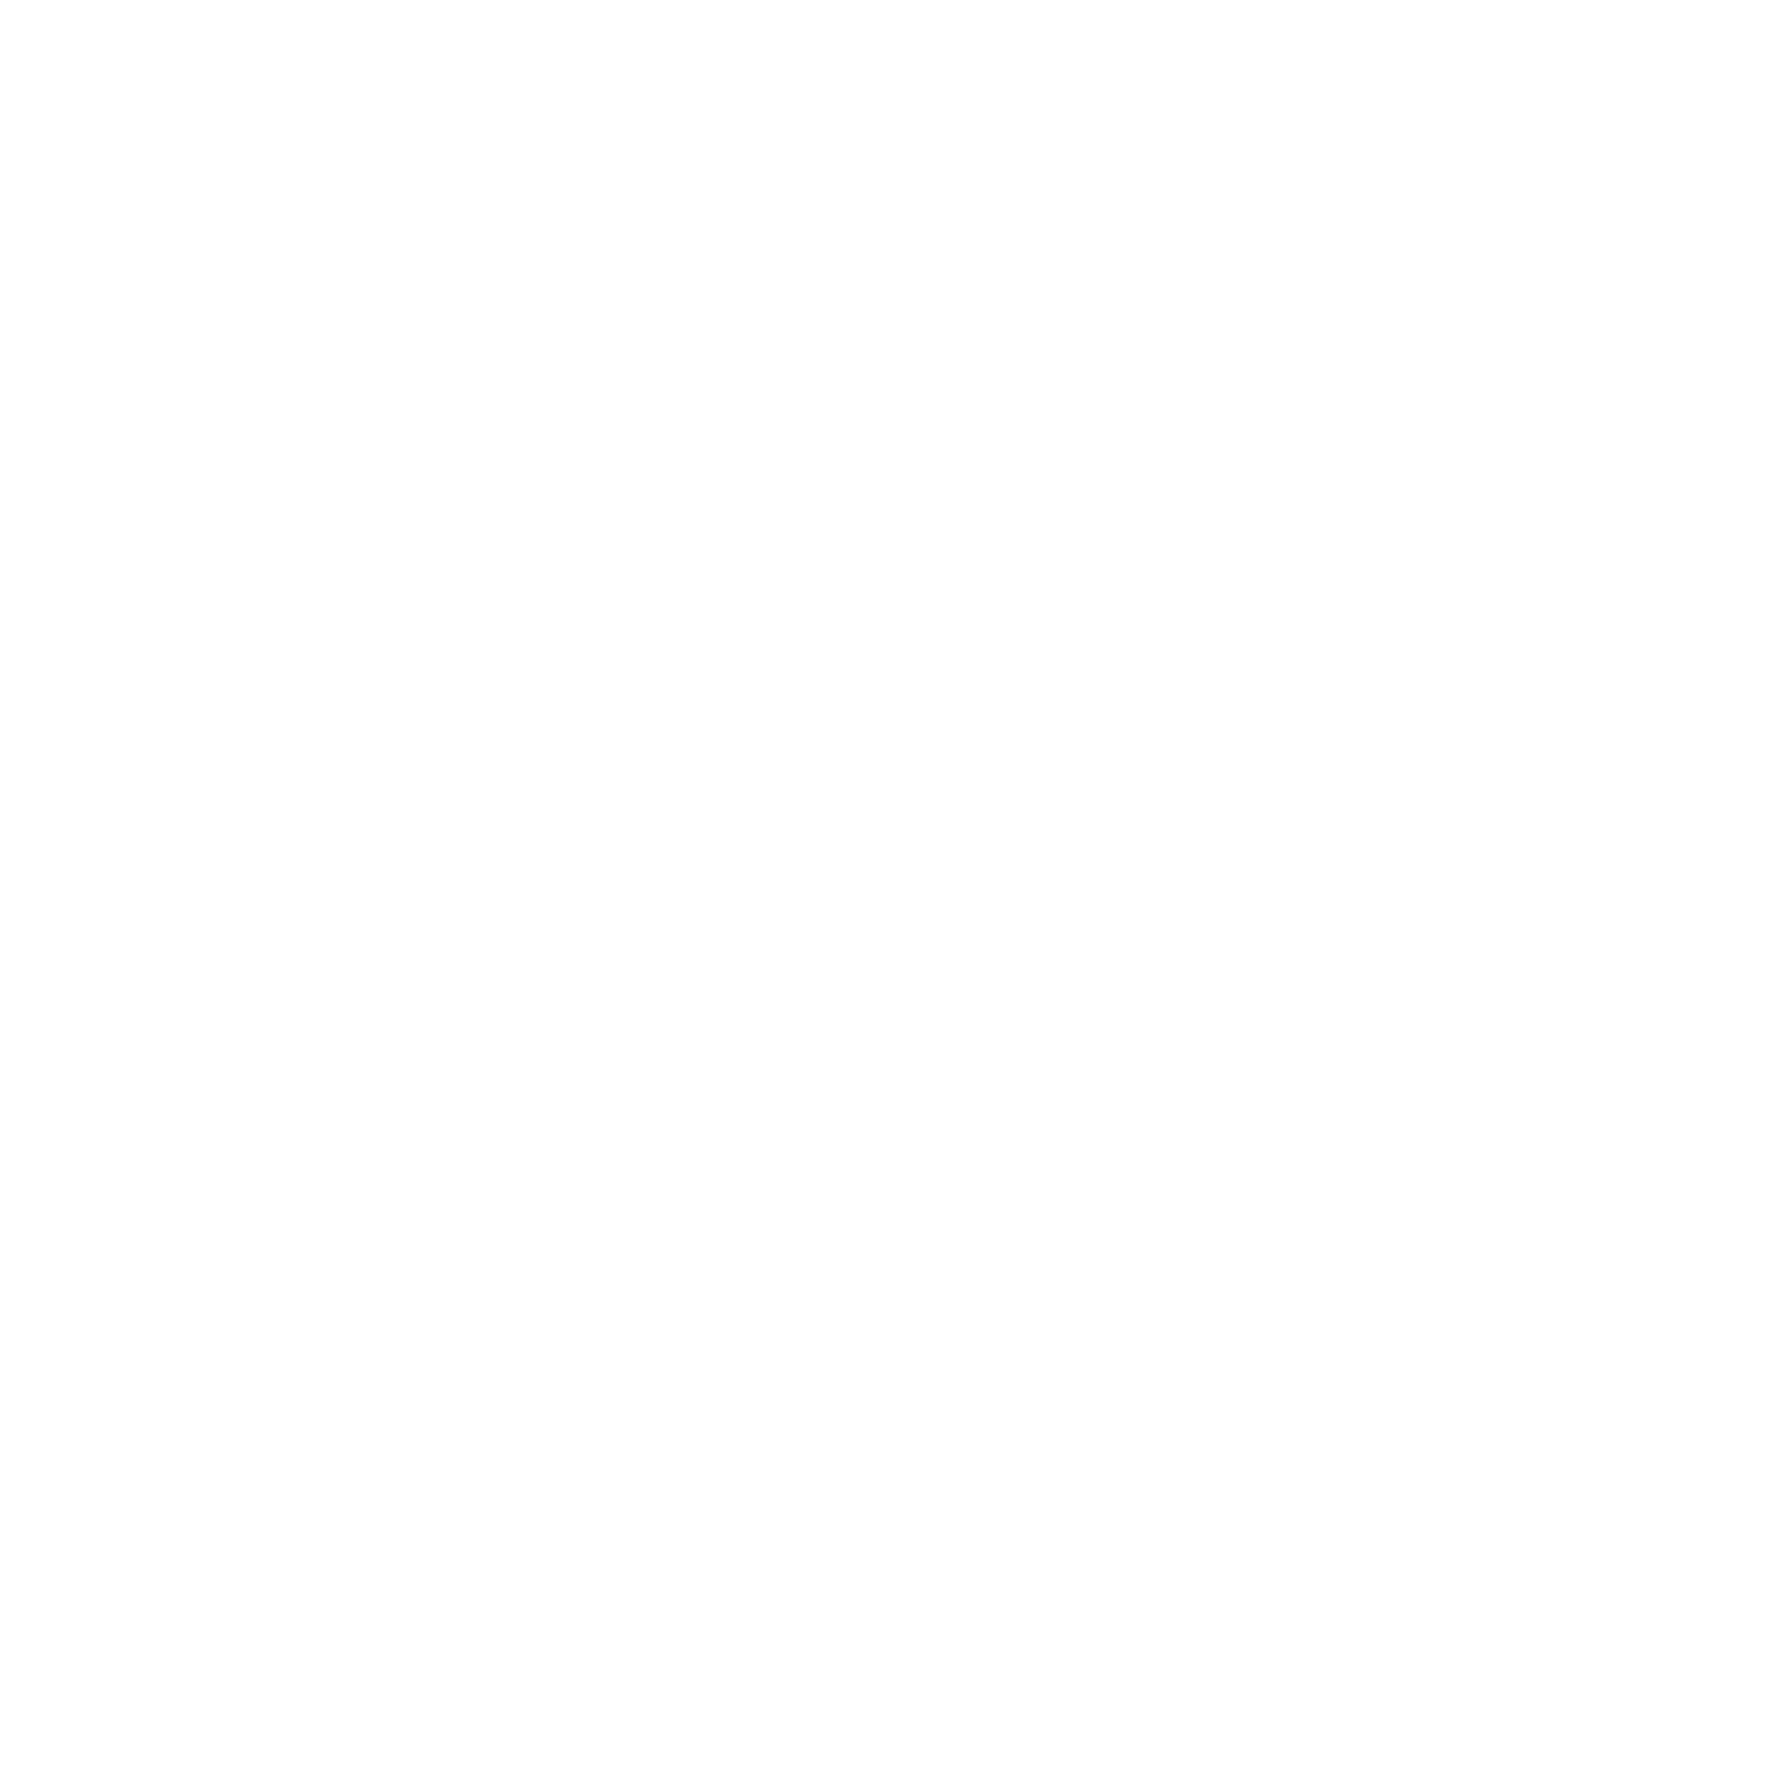 SPF-Europe